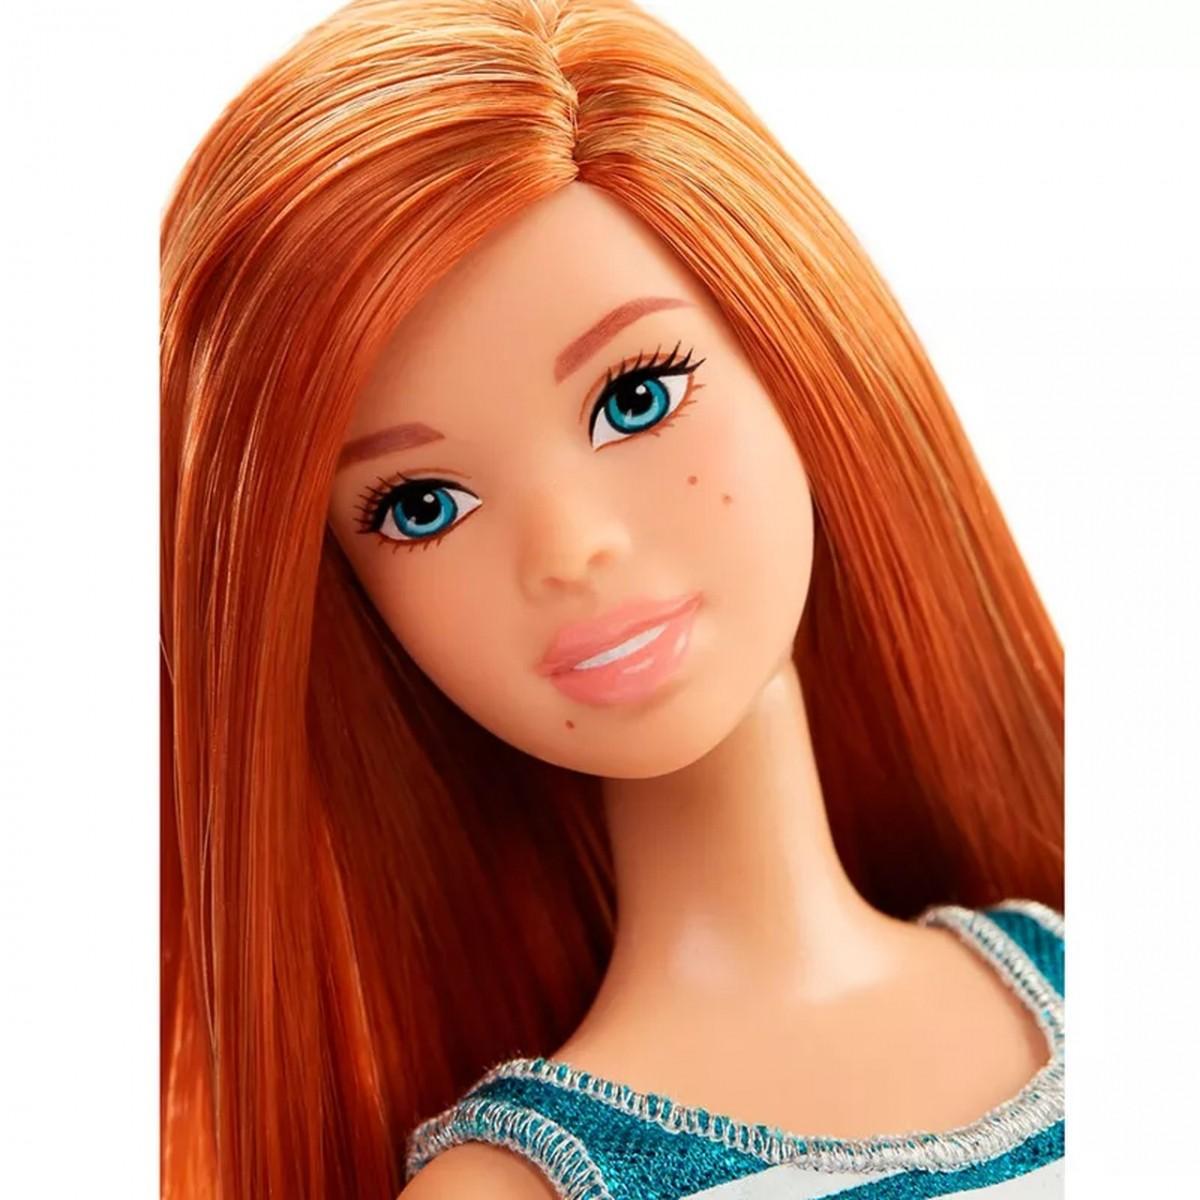 Boneca Barbie Fashionista (Ruiva de Vestido)